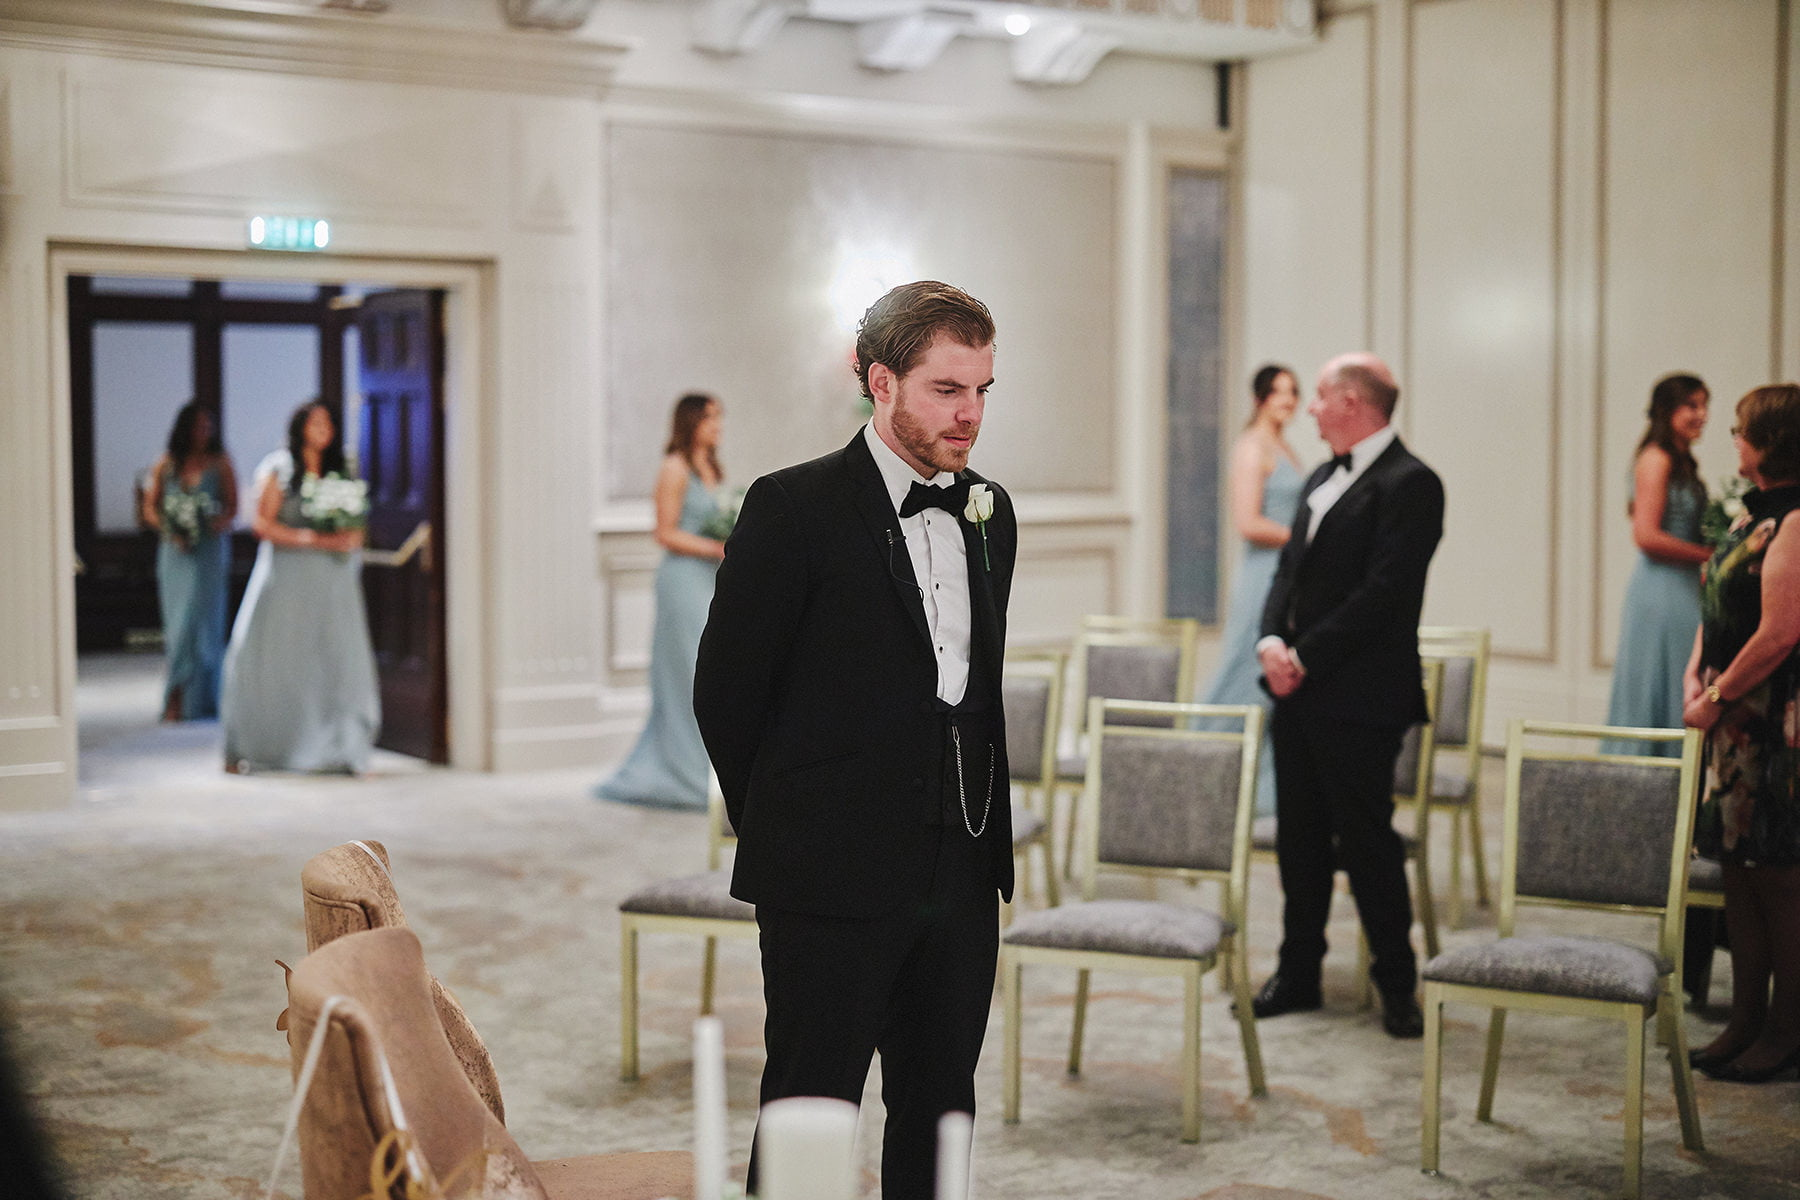 POWERSCOURT HOTEL RESORT INTIMATE WEDDING 39